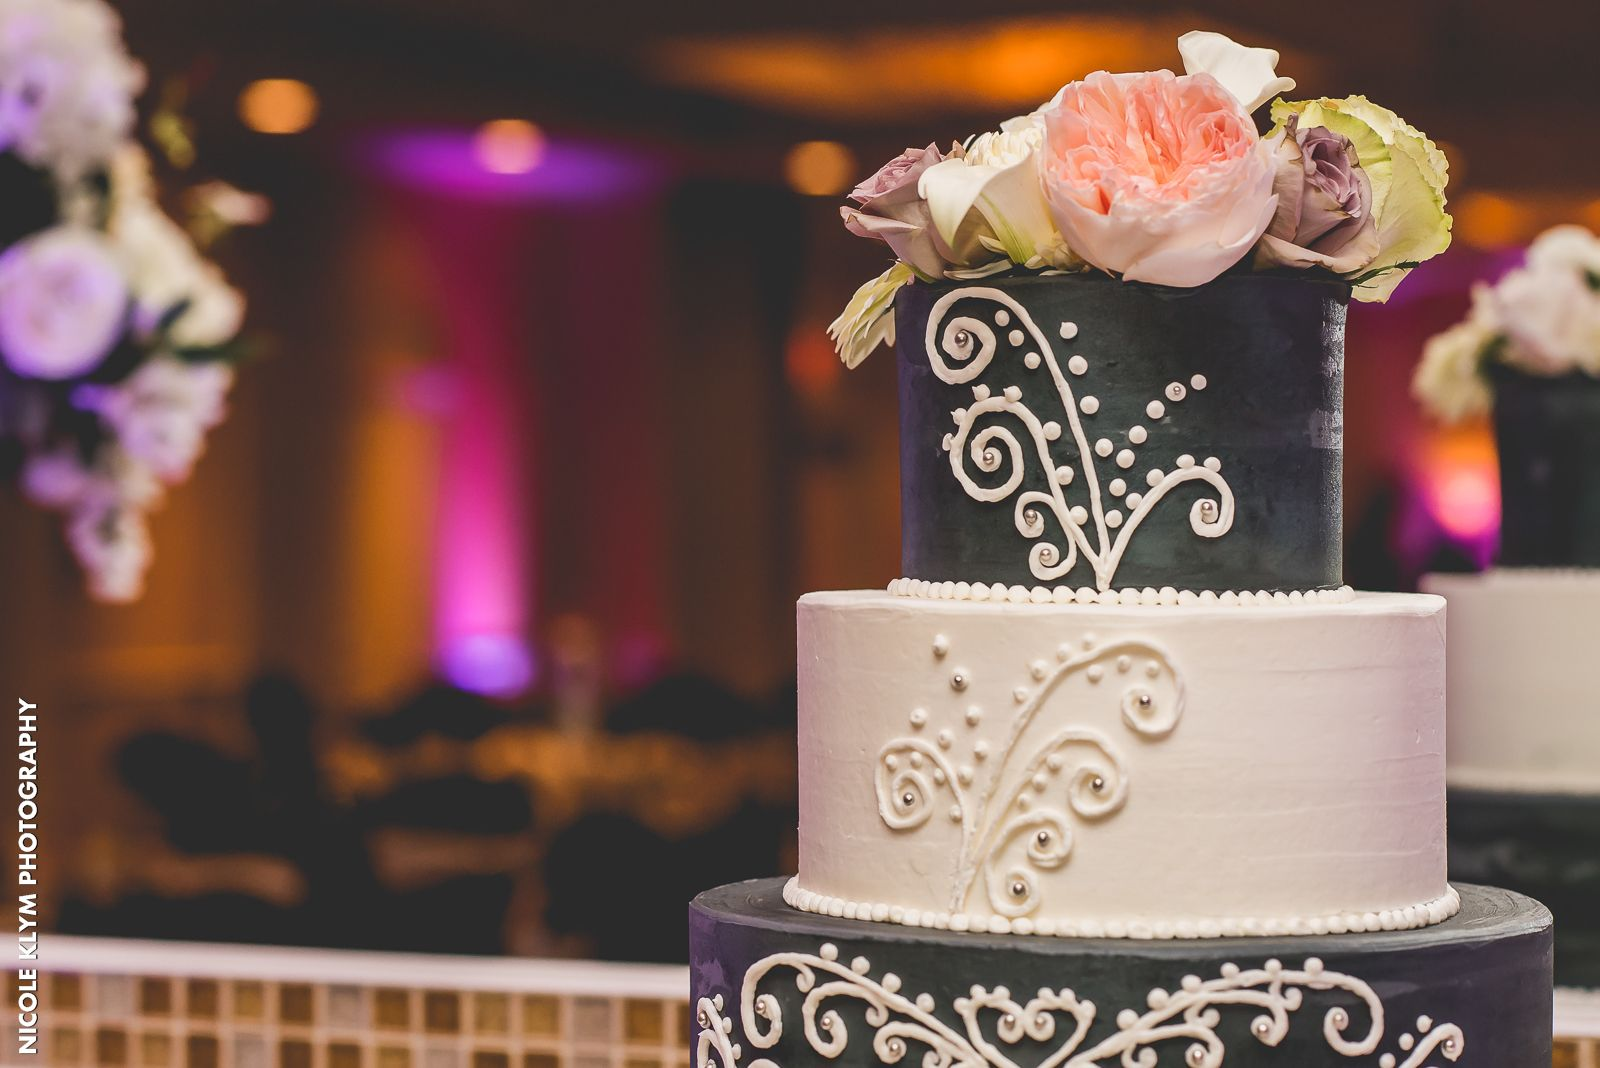 A Beautiful Wedding Cake By Local Bakery Chocolate Carousel